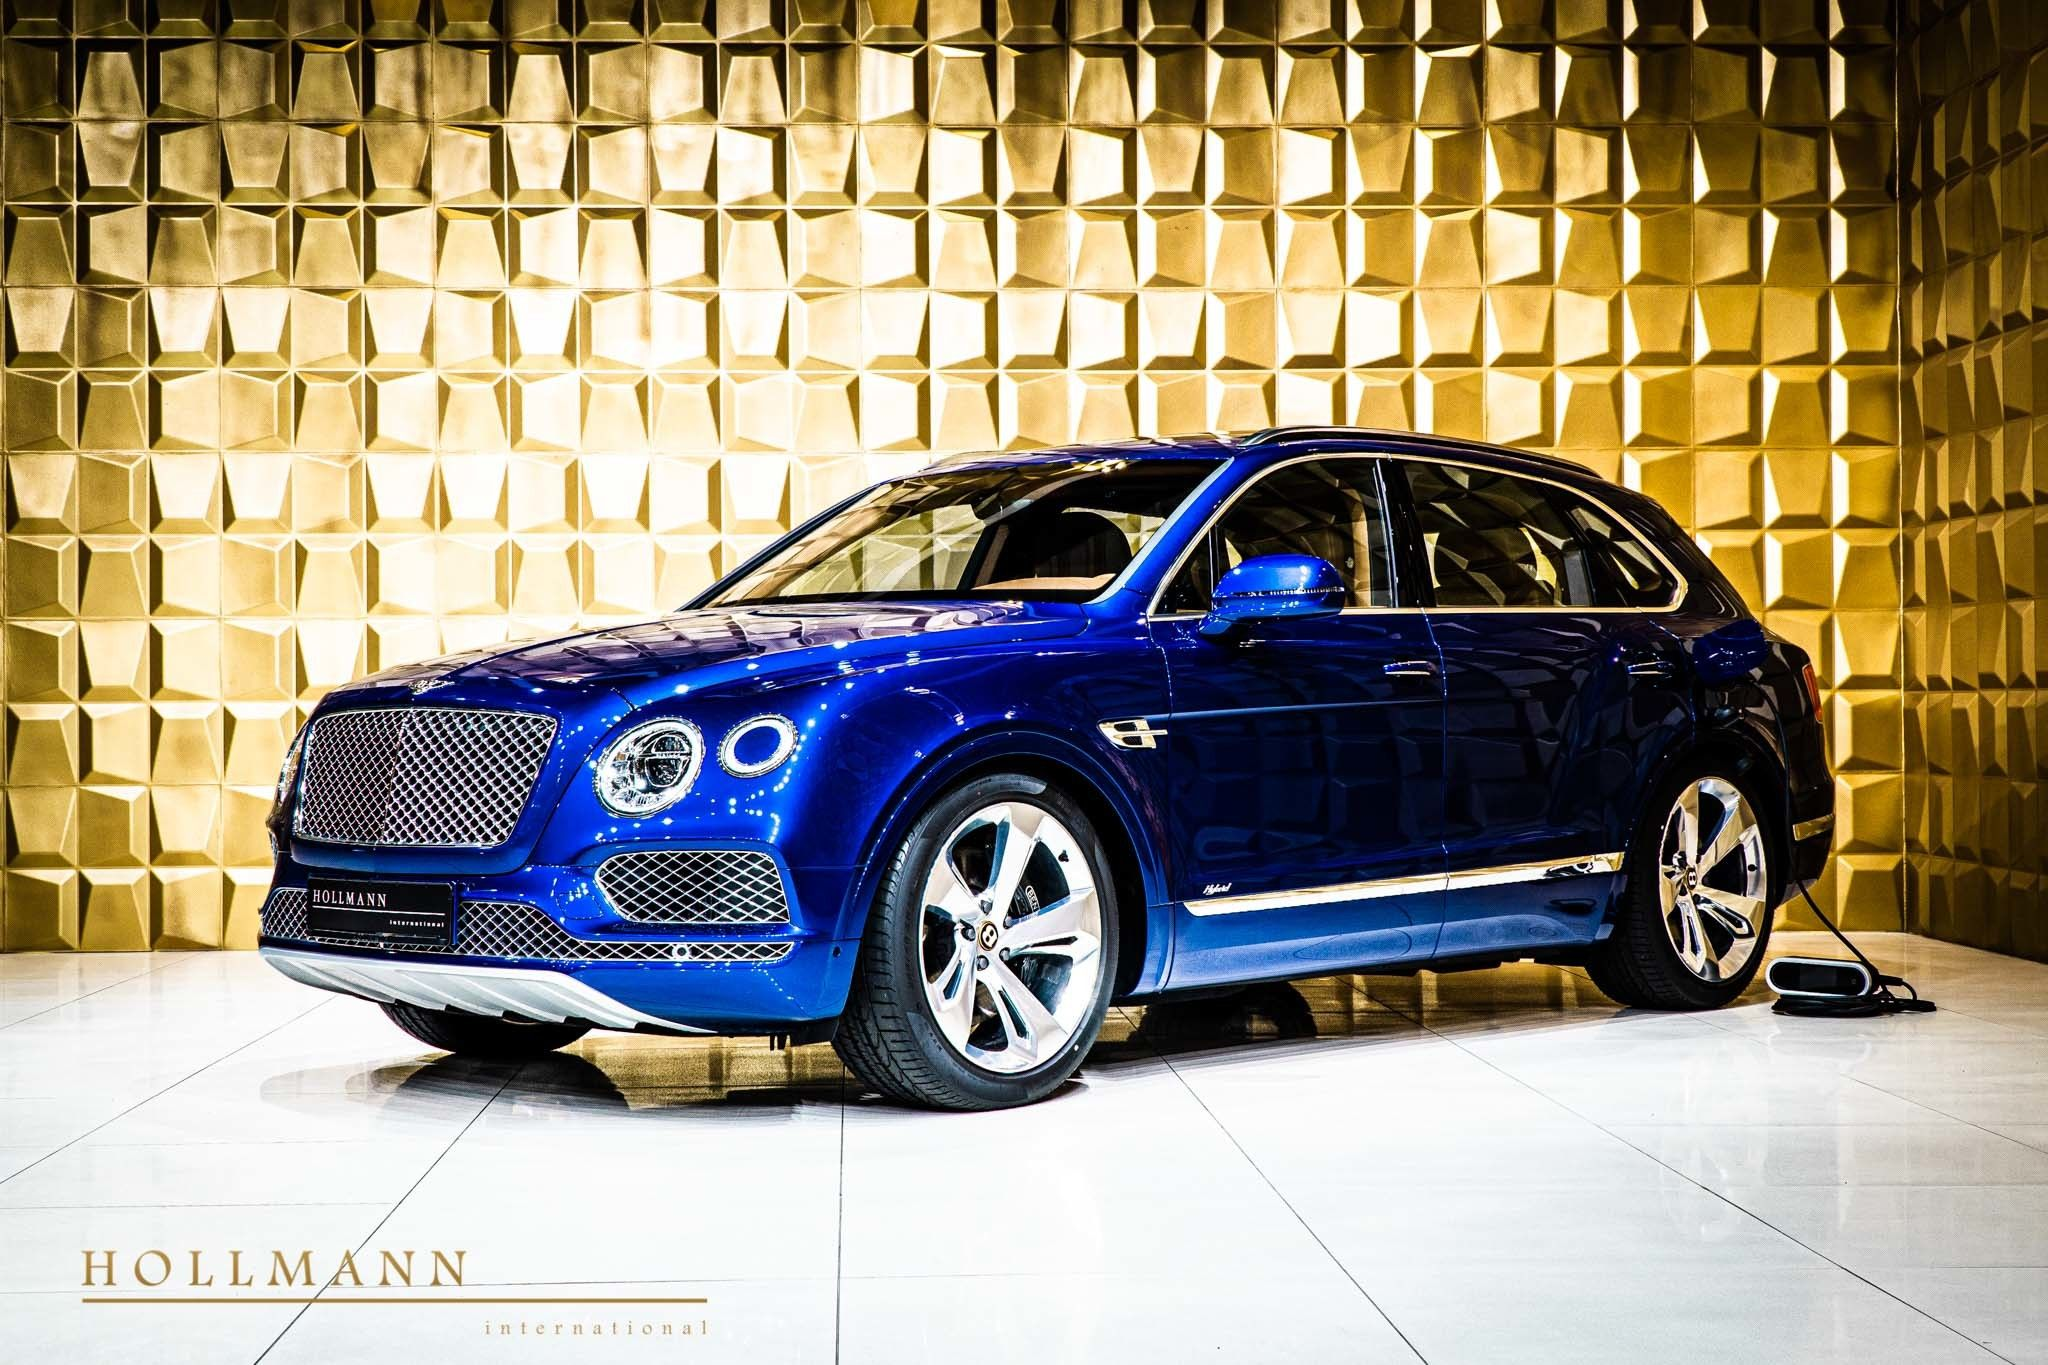 Bentley Bentayga Hybrid Hollmann International Germany For Sale On Luxurypulse Bentley Best Luxury Cars Luxury Suv